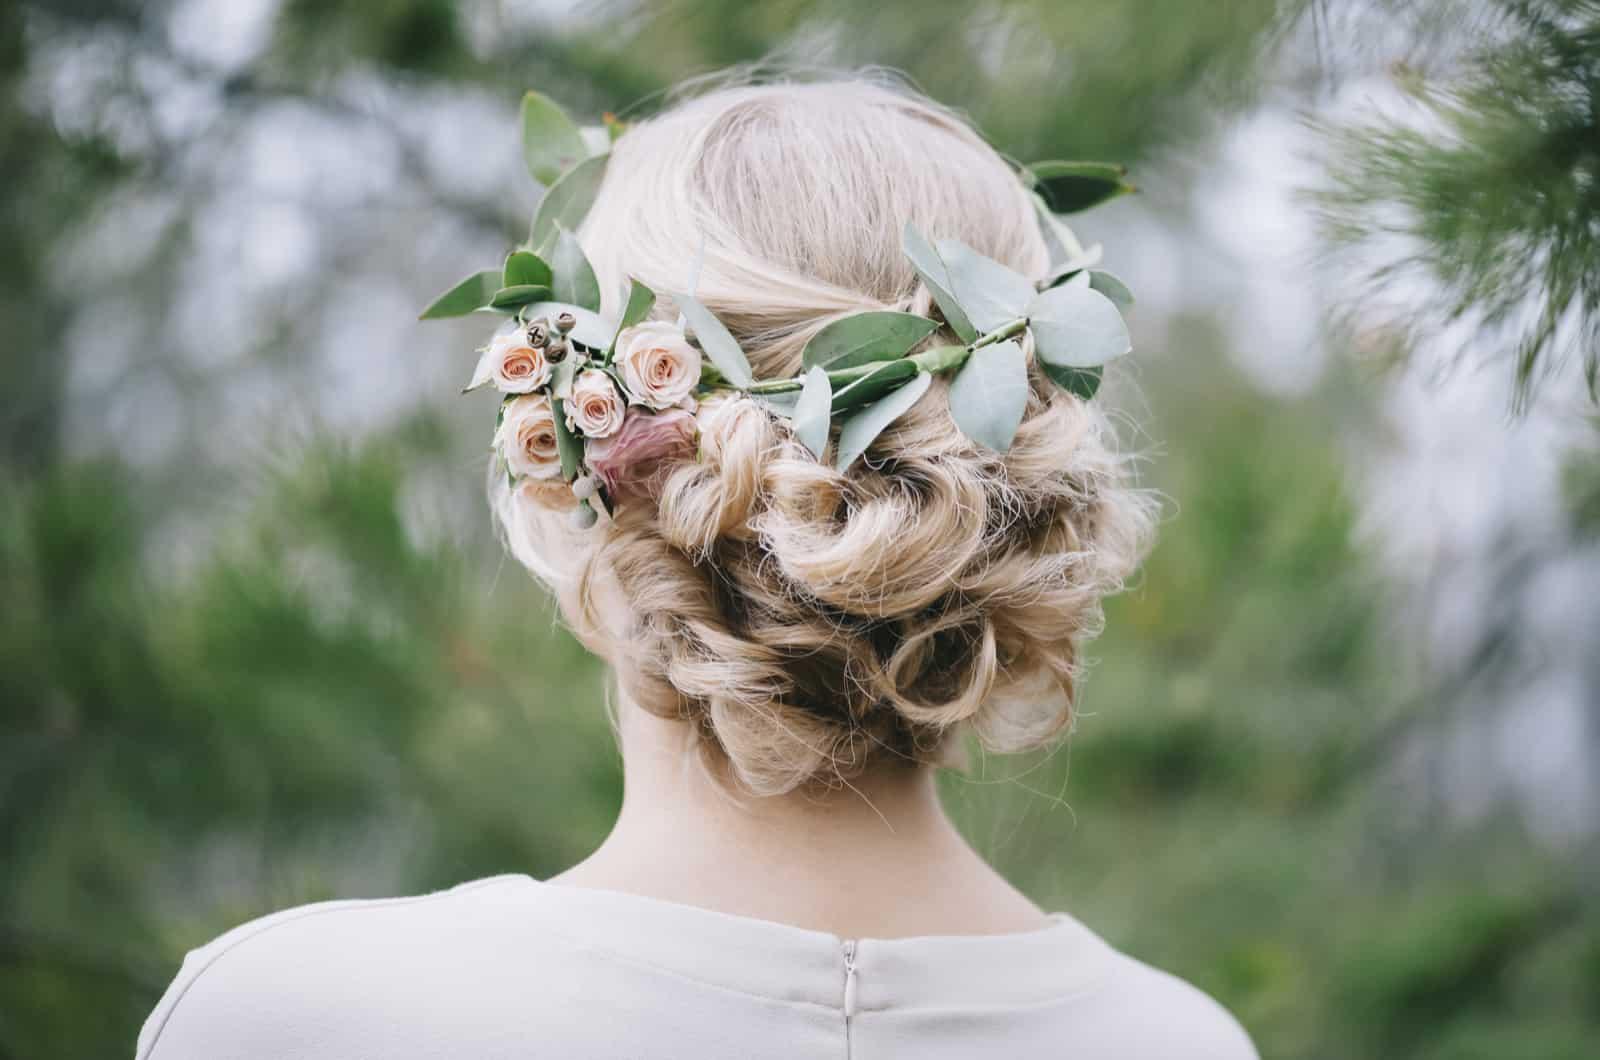 Brautfrisur mit floralen Accessoires